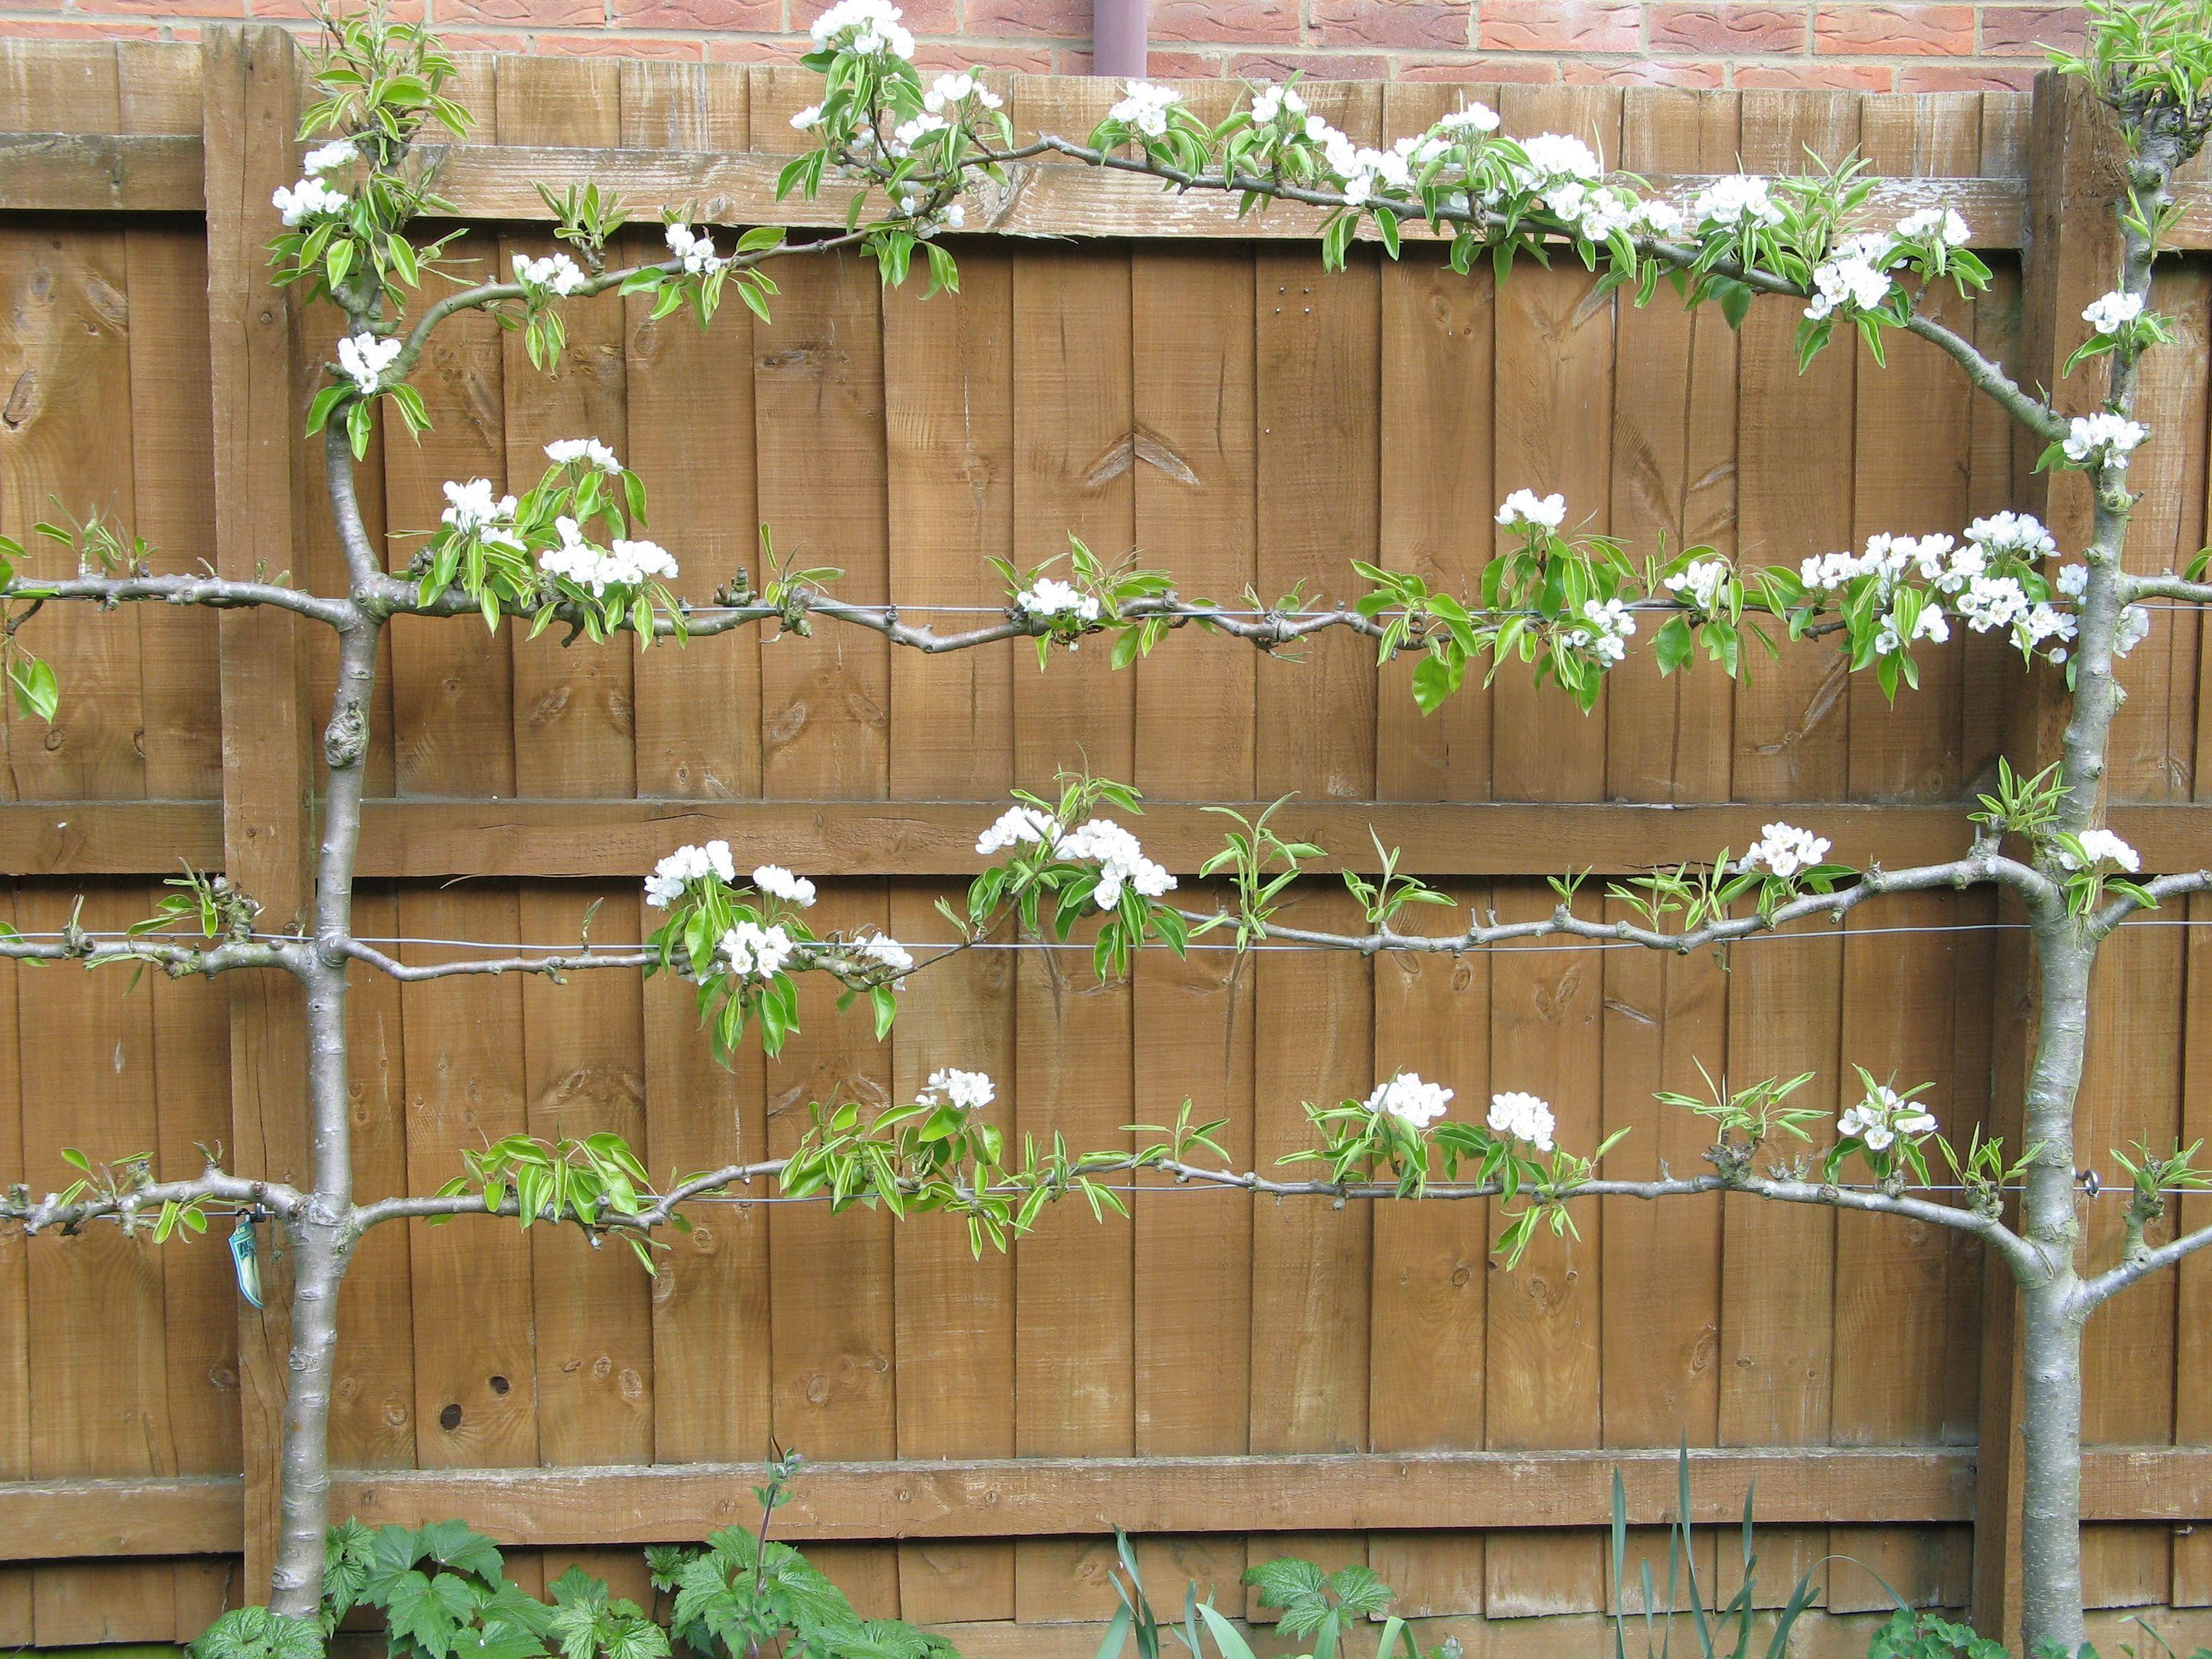 10 Fruit Garden Ideas Brilliant And Also Stunning Fruit Tree Garden Small Gardens Small Garden Design